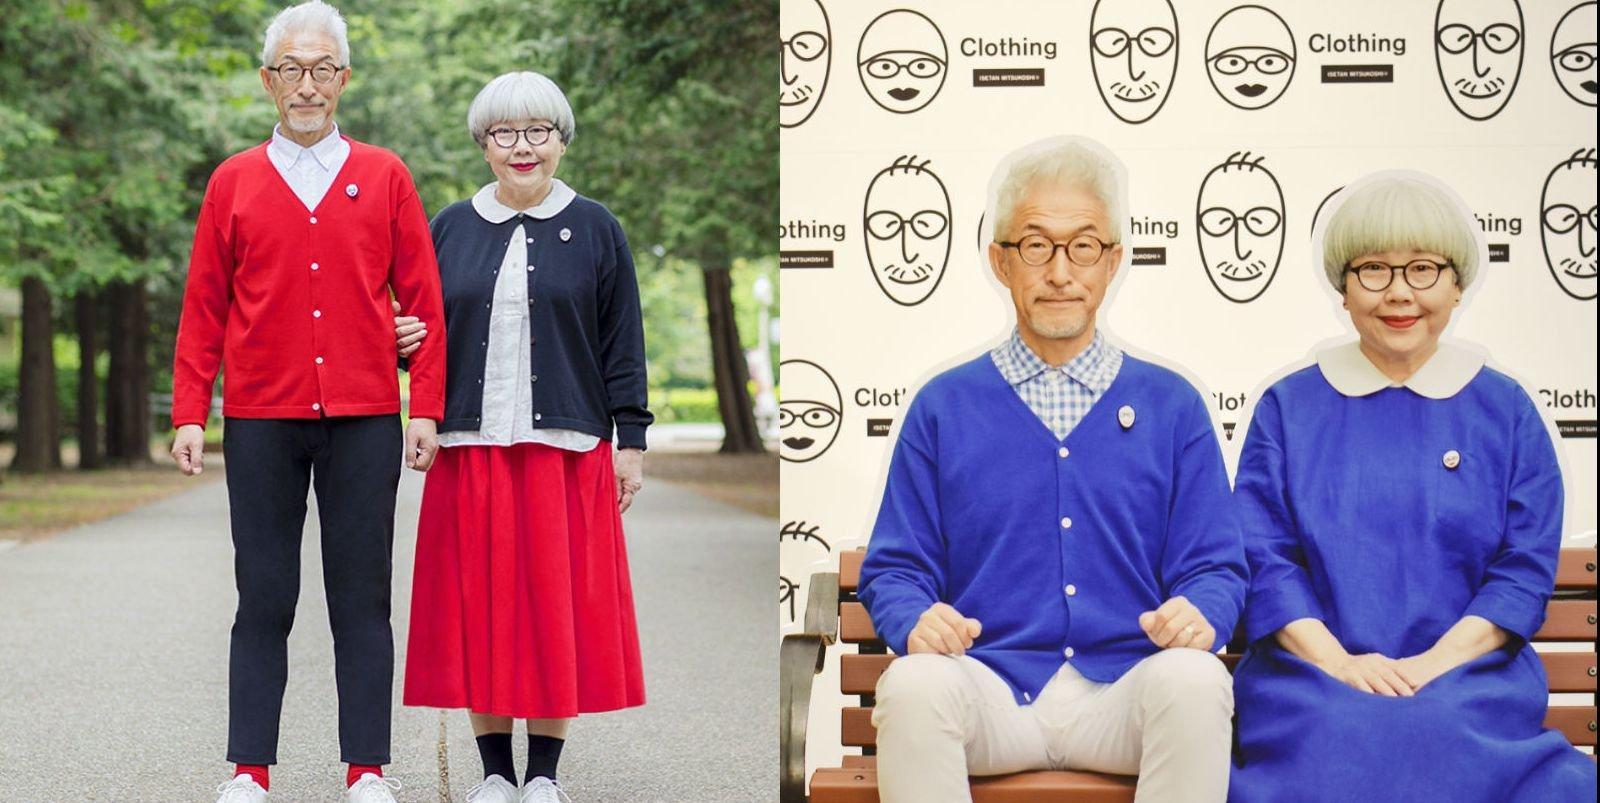 img 5b5a1ad5f2987.png?resize=300,169 - 日本網紅銀髮夫妻「BonPon」示範穿一輩子都不會過時的情侶裝,只想和你一起慢慢變老~